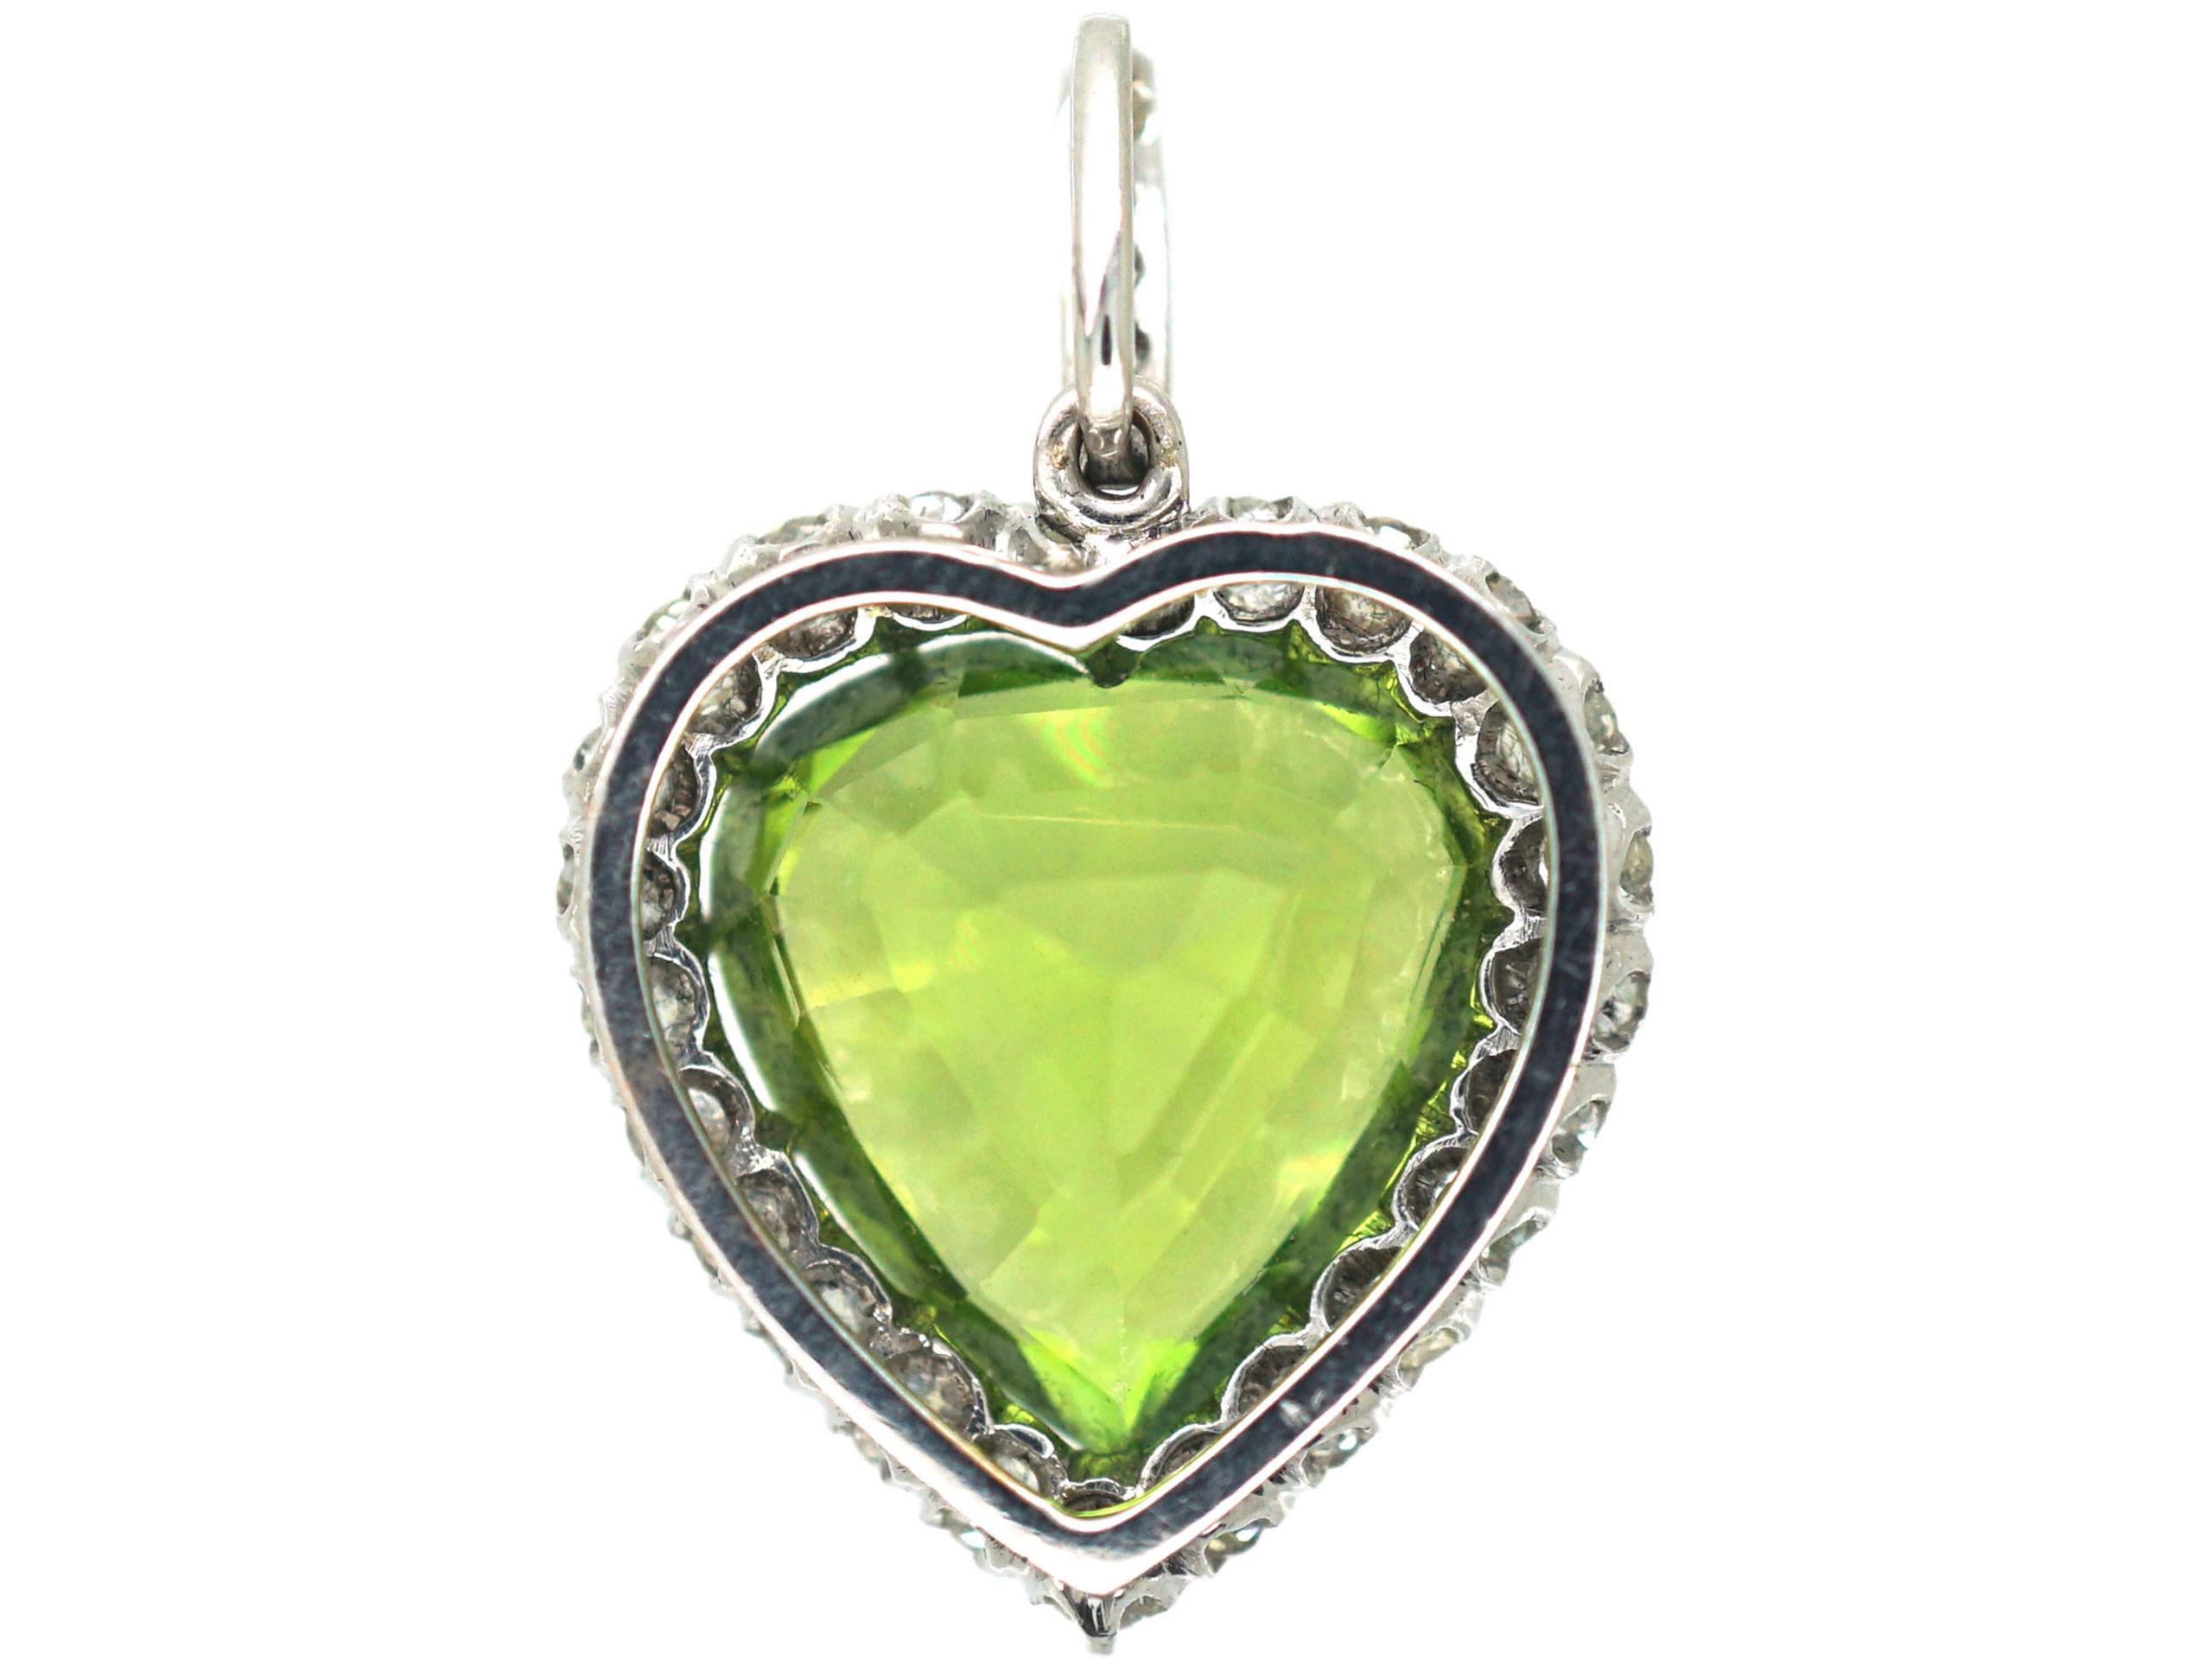 Edwardian Platinum, Peridot & Diamond Heart Pendant